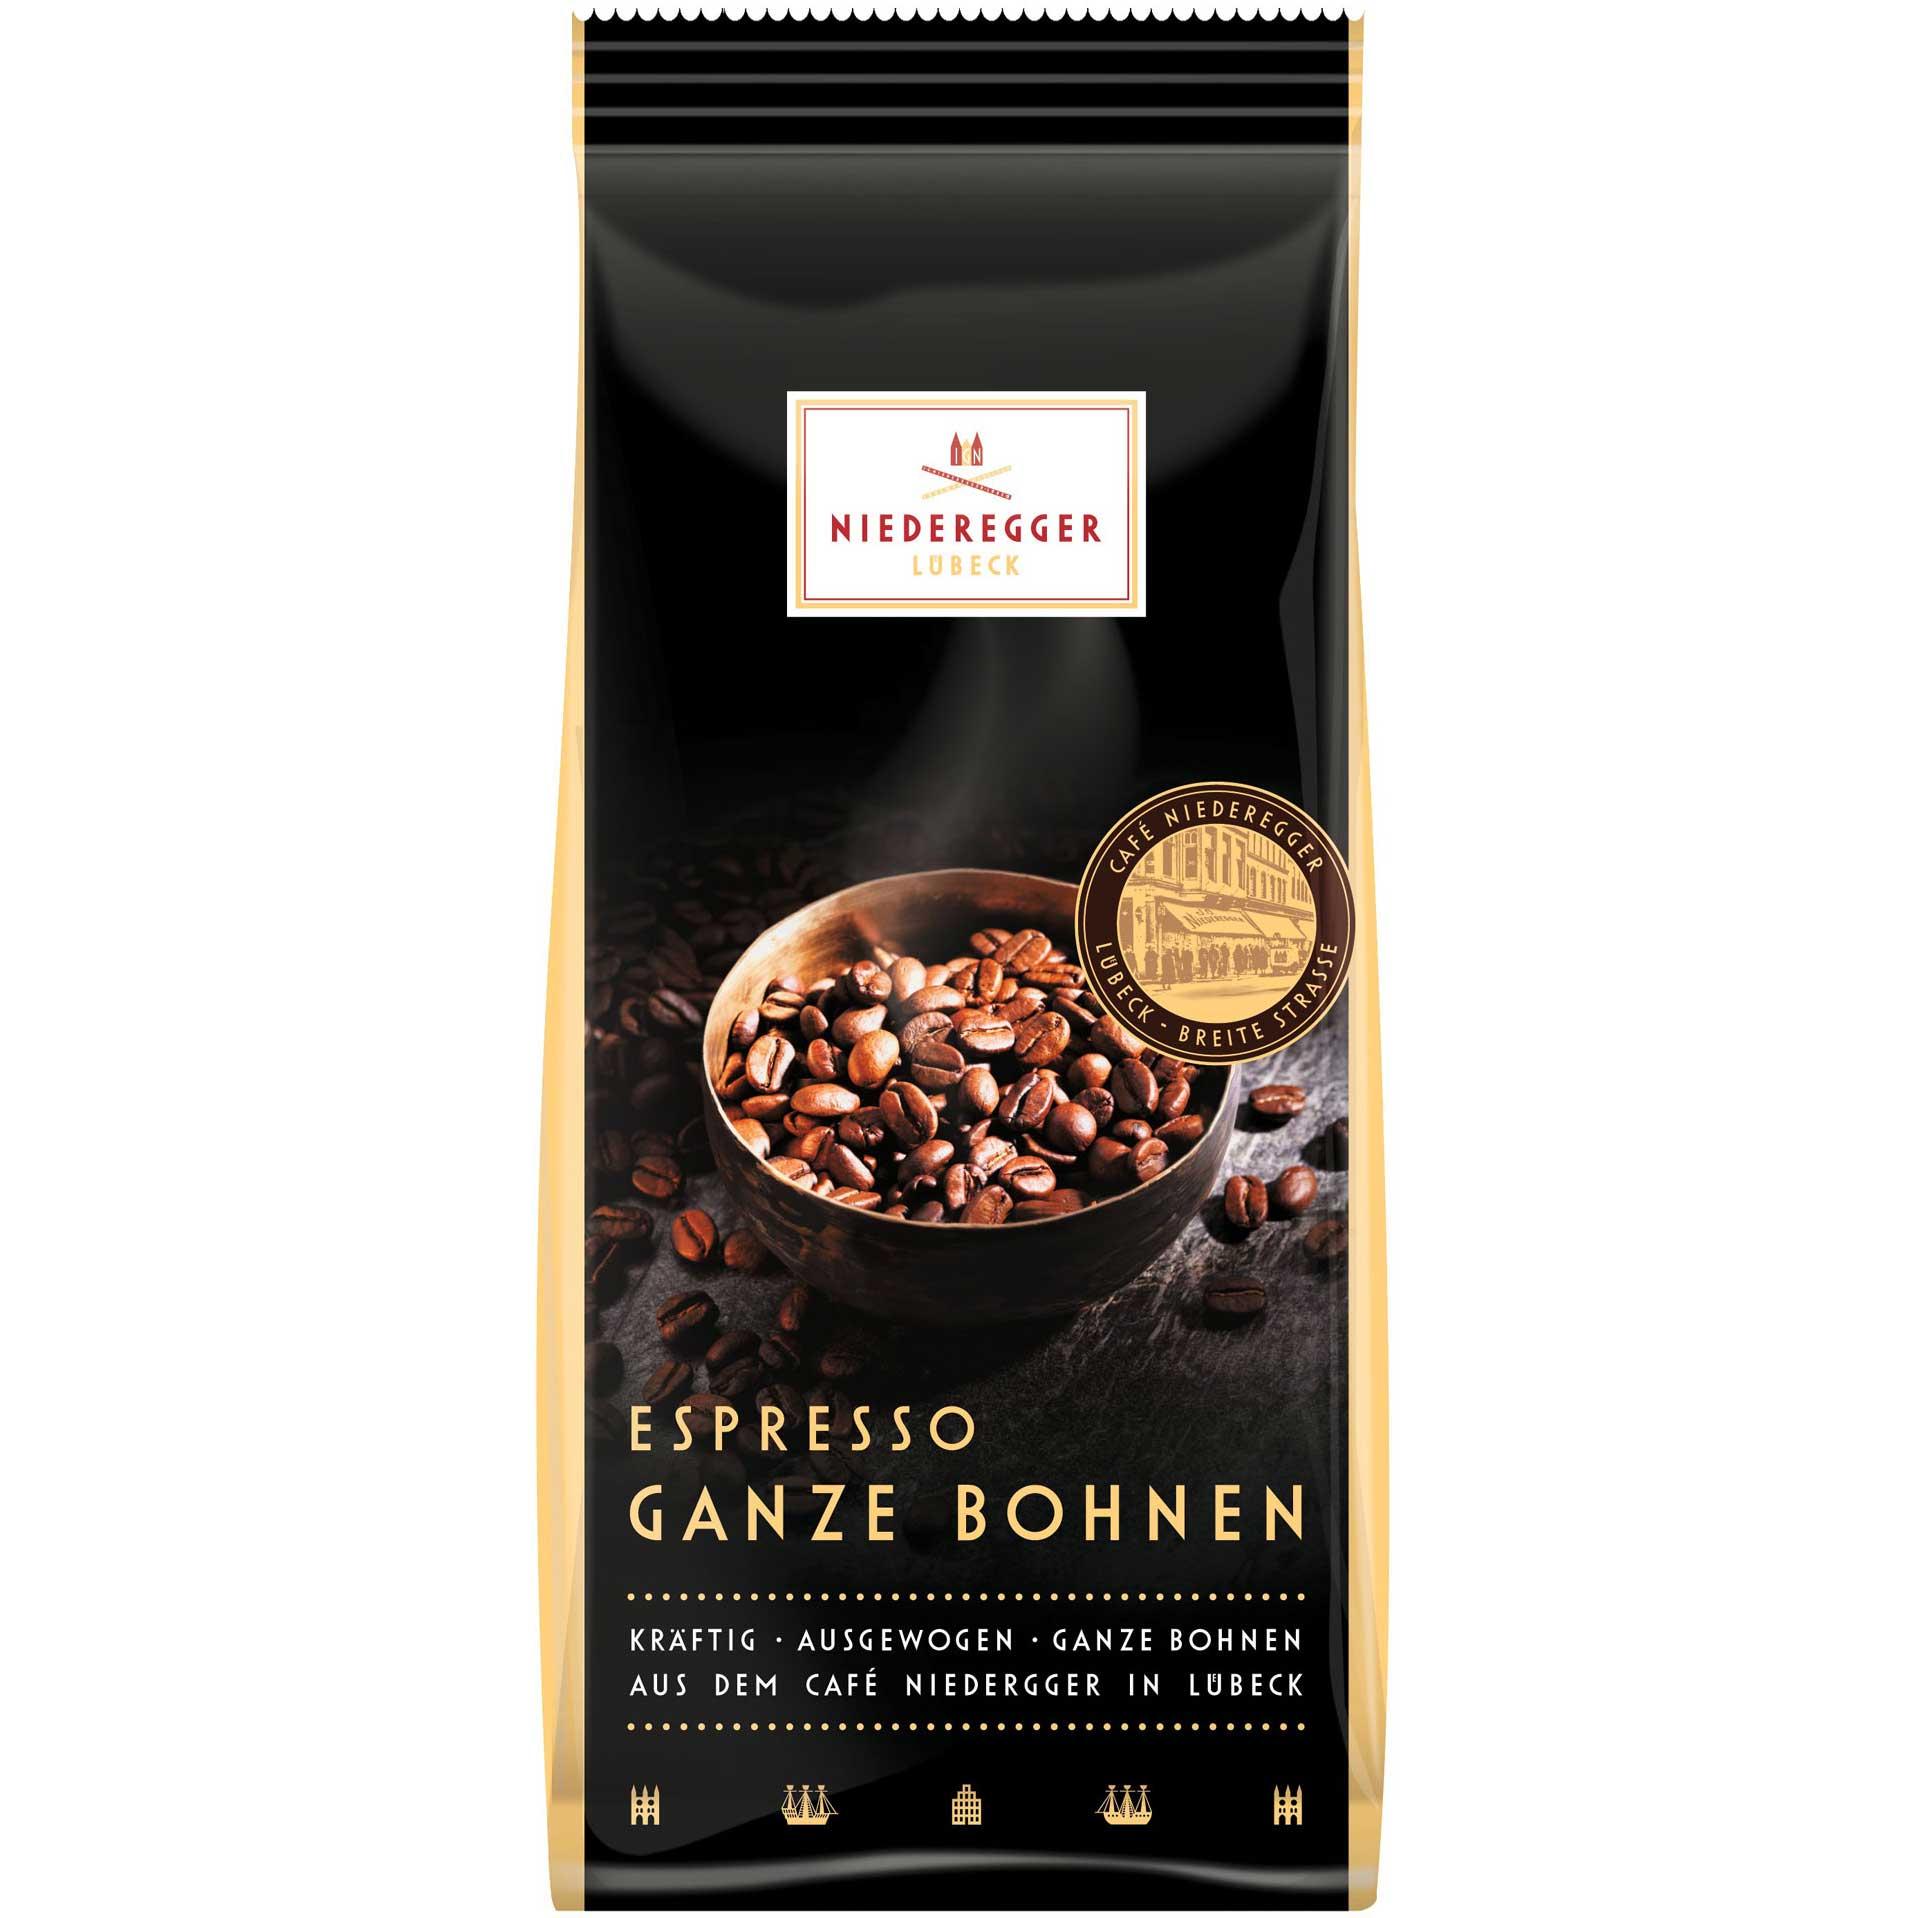 niederegger espresso ganze bohnen online kaufen im world of sweets shop. Black Bedroom Furniture Sets. Home Design Ideas